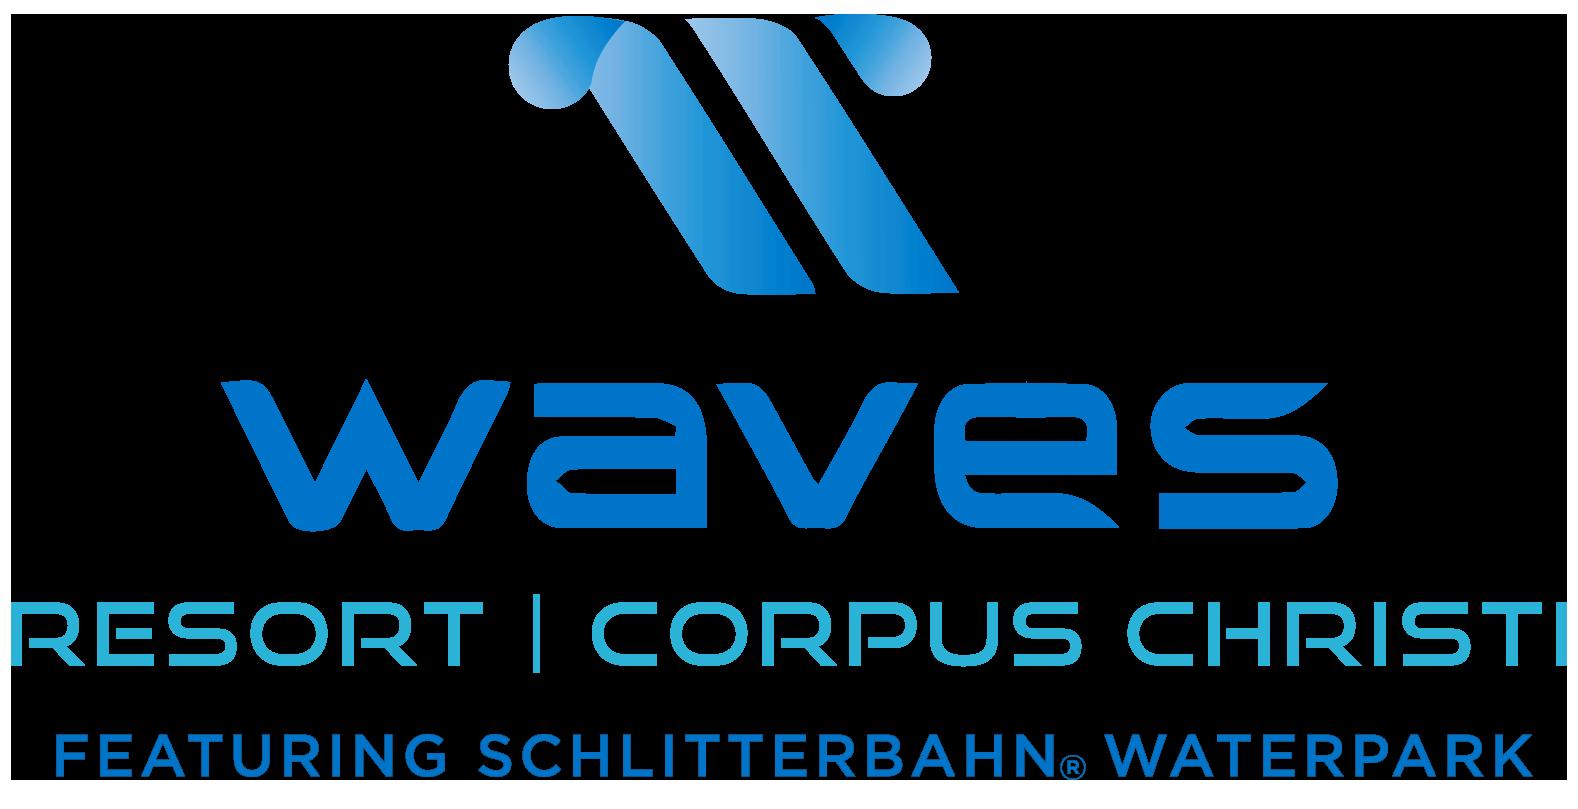 Jobs Available in Corpus Christi at Schlitterbahn Riverpark.